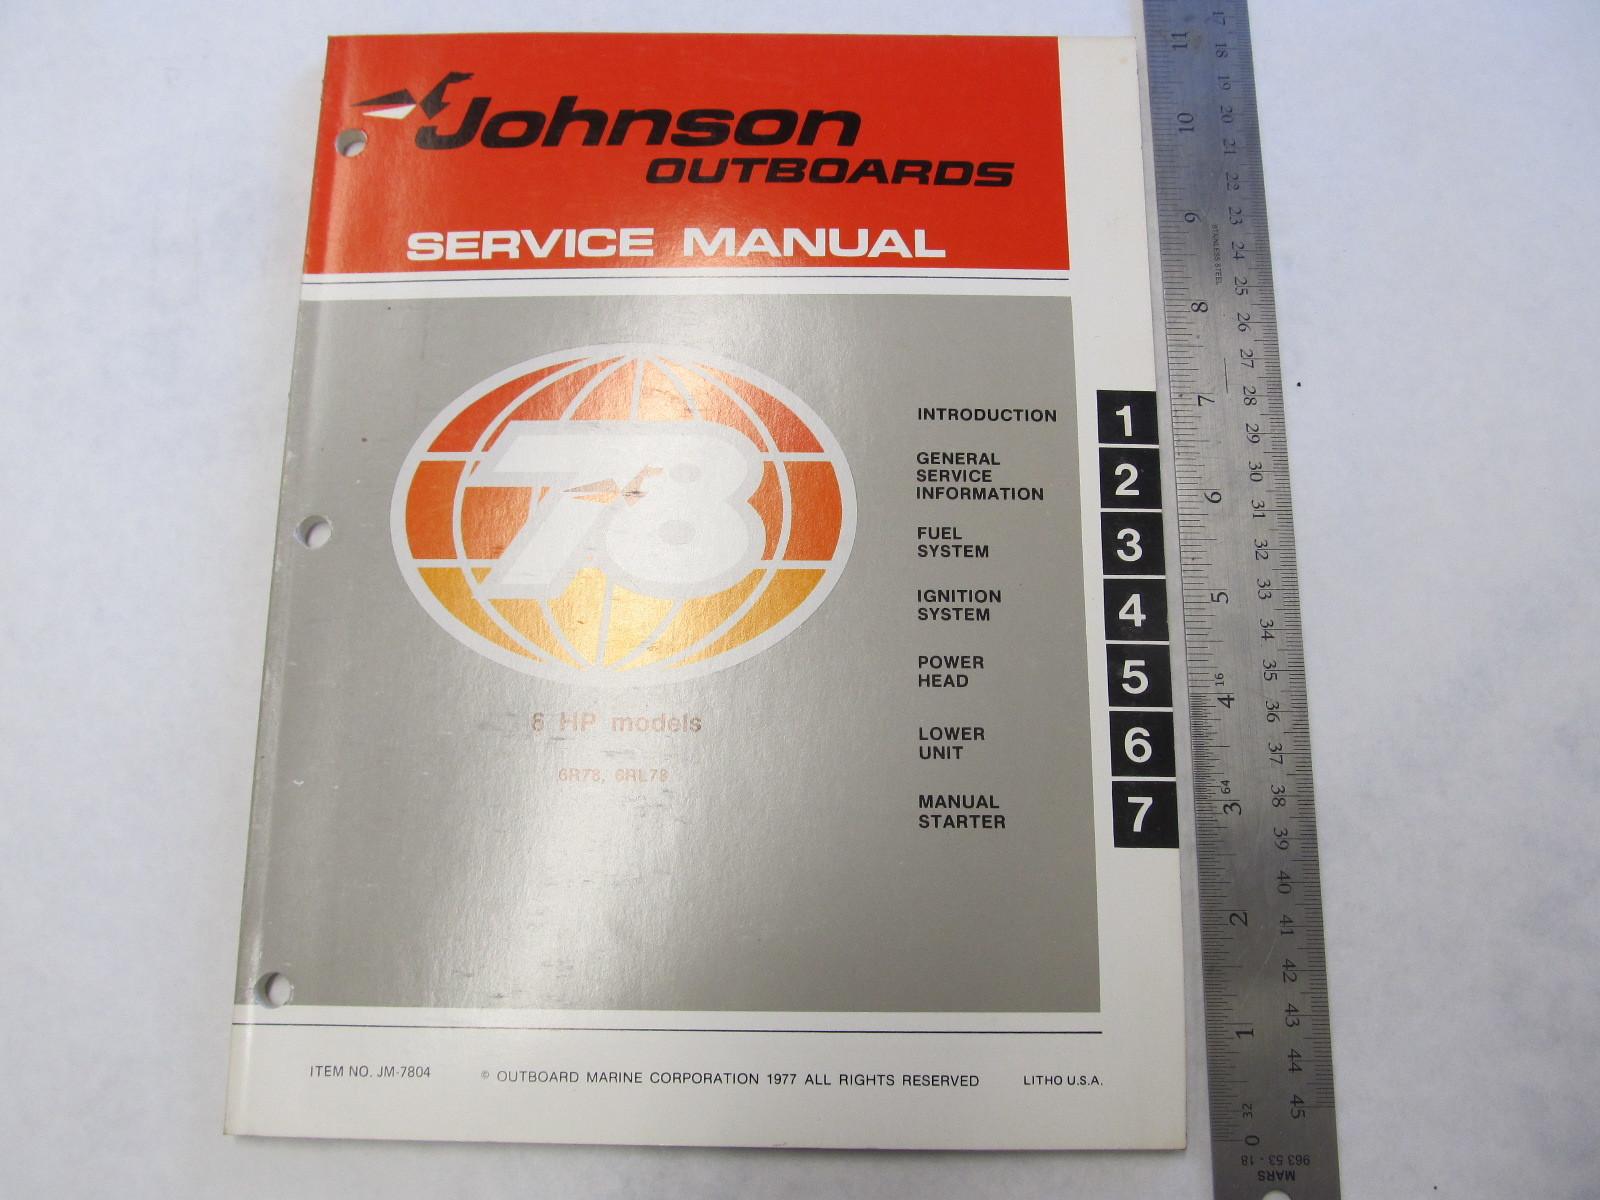 2004 Johnson Outboard Service Manual